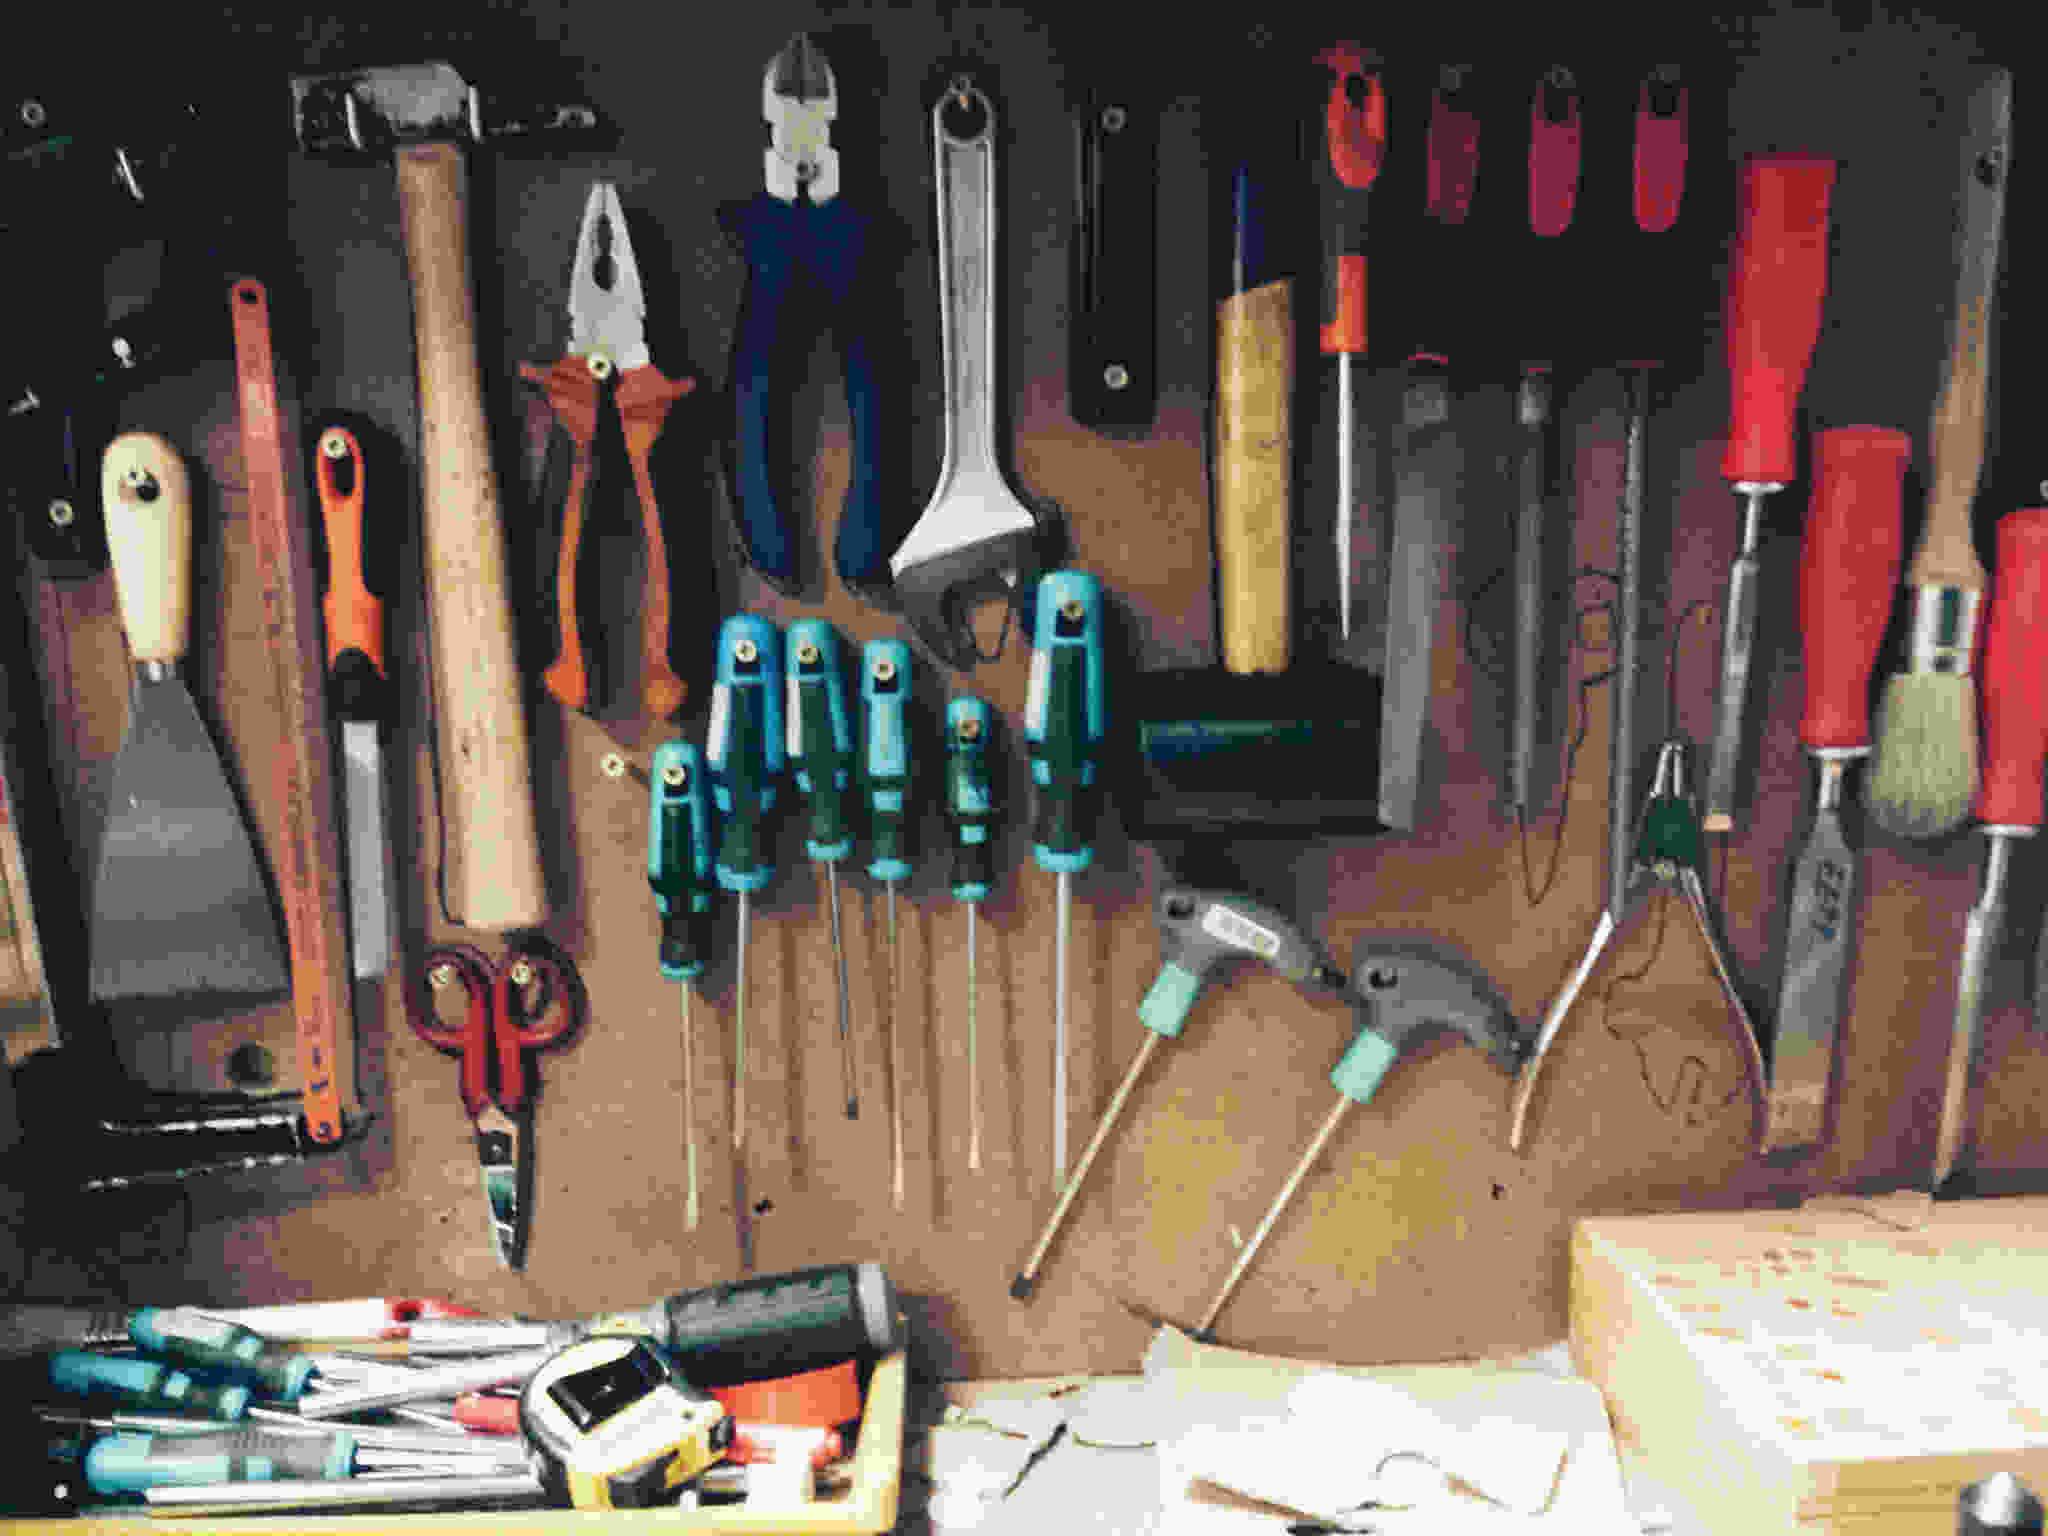 Guys tools